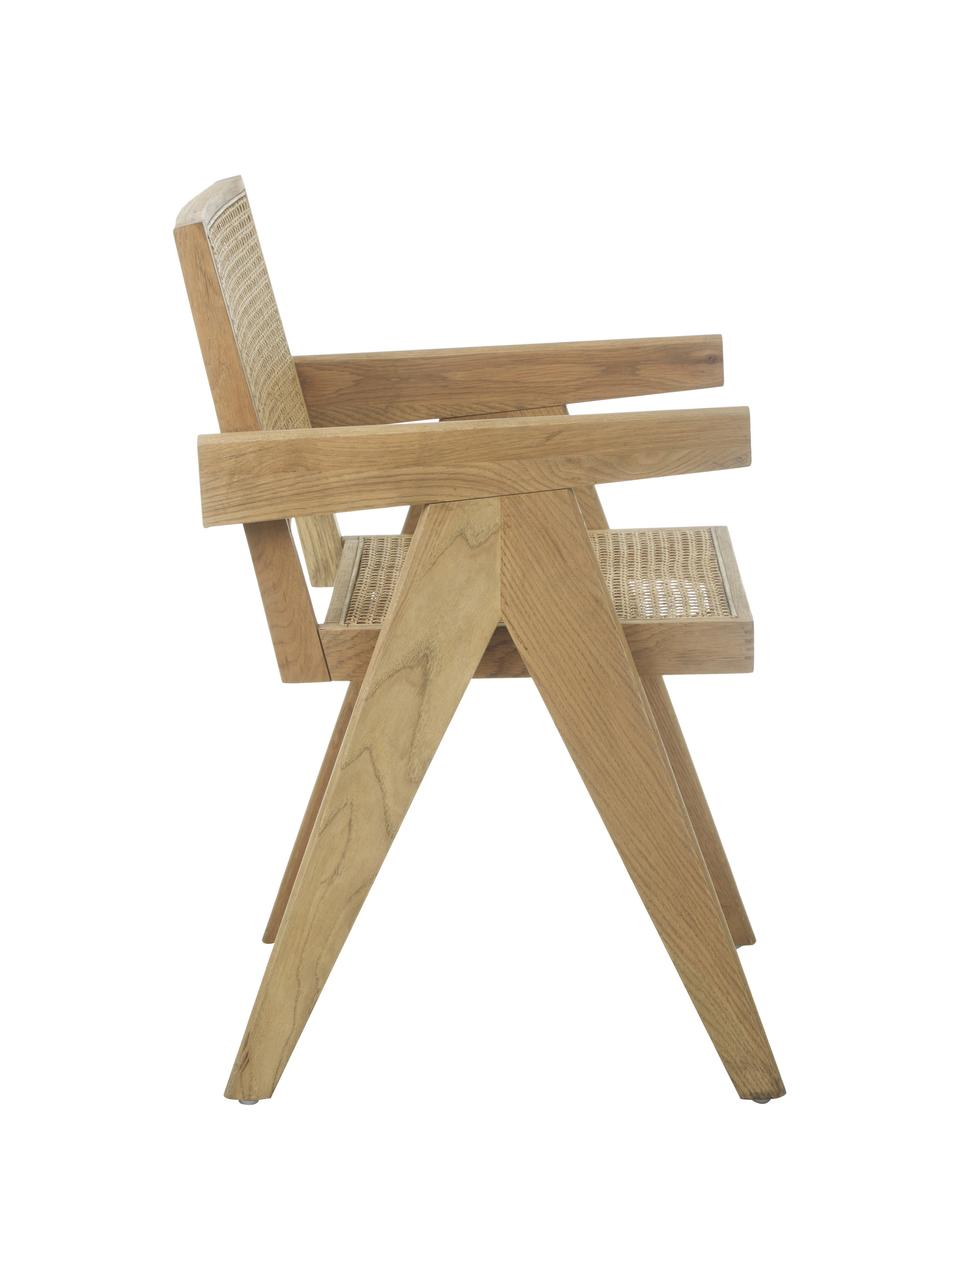 Armstoel Sissi met Weens vlechtwerk, Frame: massief eikenhout, Zitvlak: rotan, Frame: eikenhoutkleurig.Zitvlak: beige, B 52 x D 58 cm